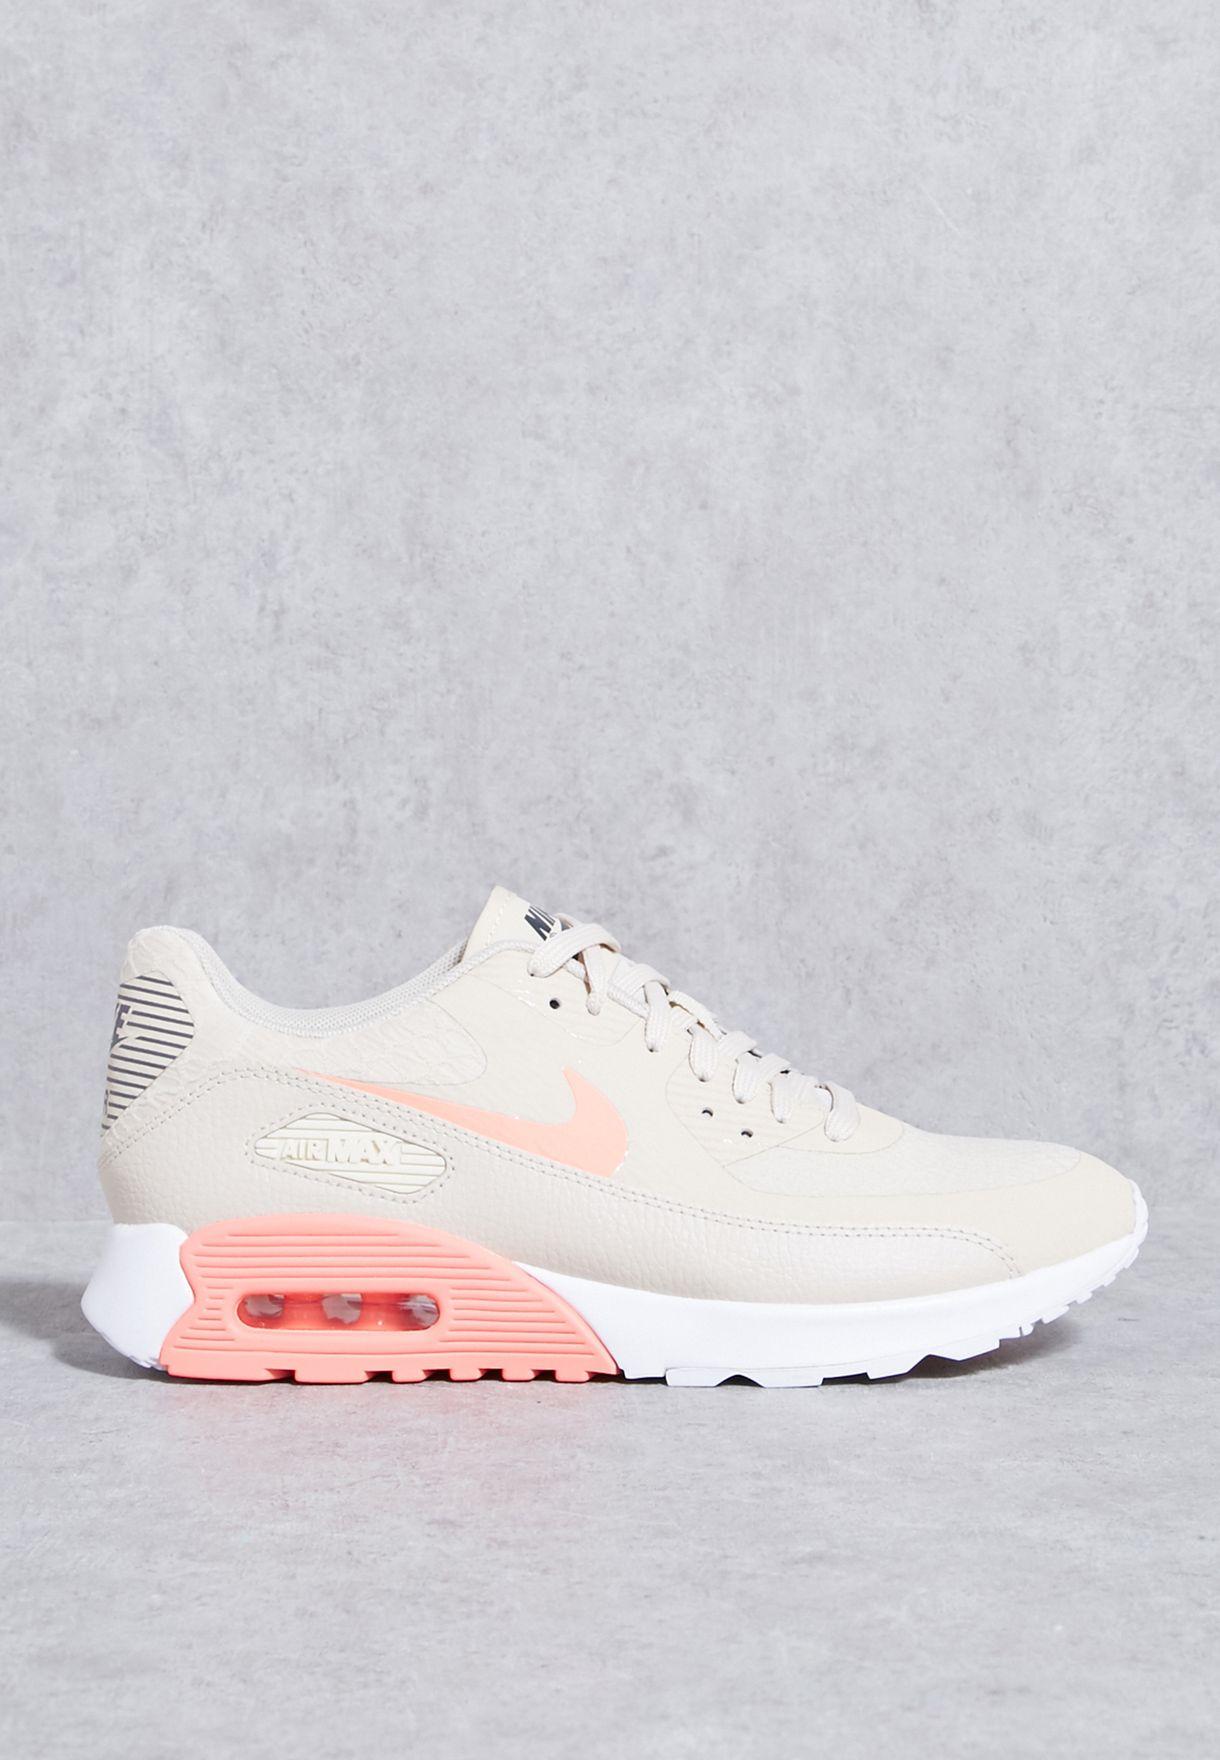 538af581da Shop Nike beige air Max 90 Ultra 2.0 881106-100 for Women in Bahrain ...